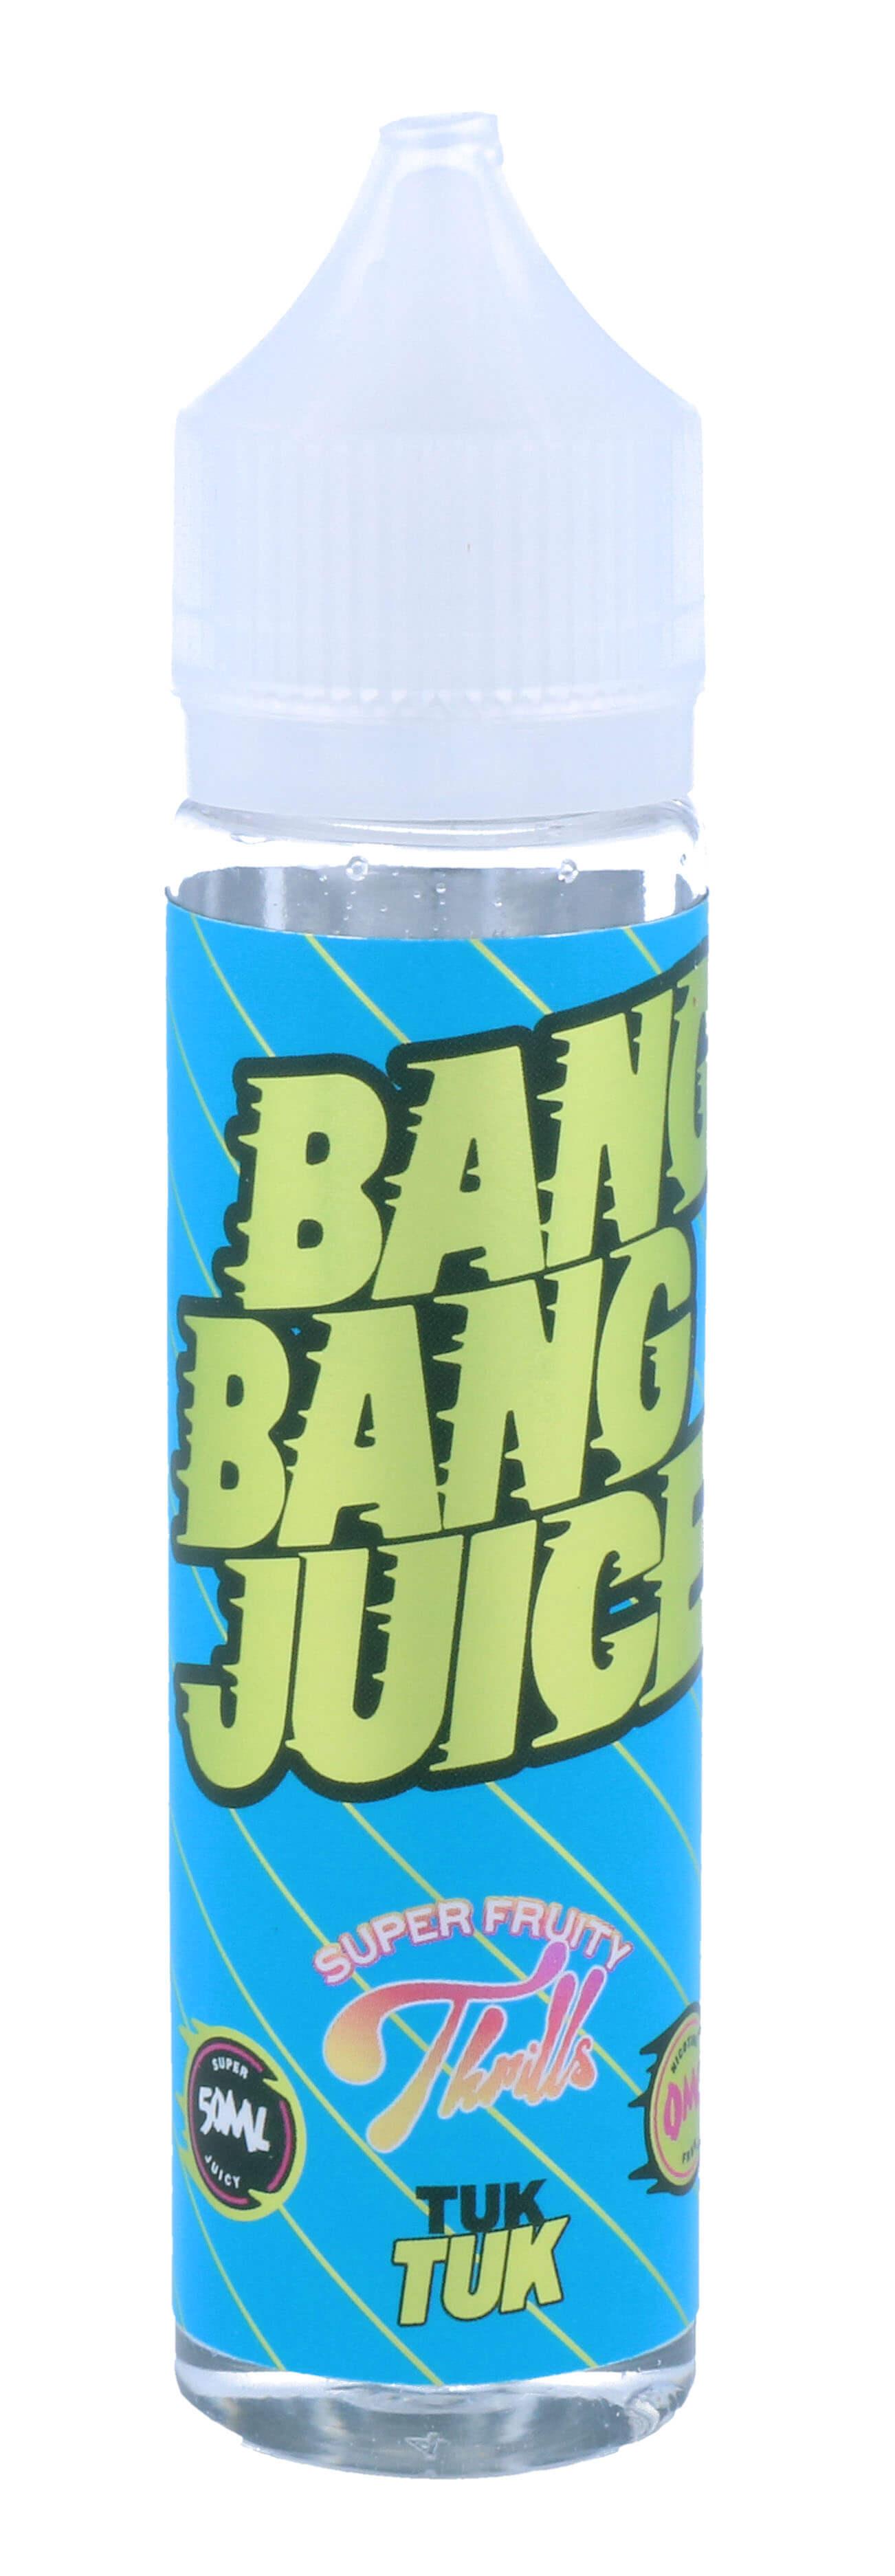 Bang Bang Juice - Tuk Tuk - 50ml - 0mg/ml